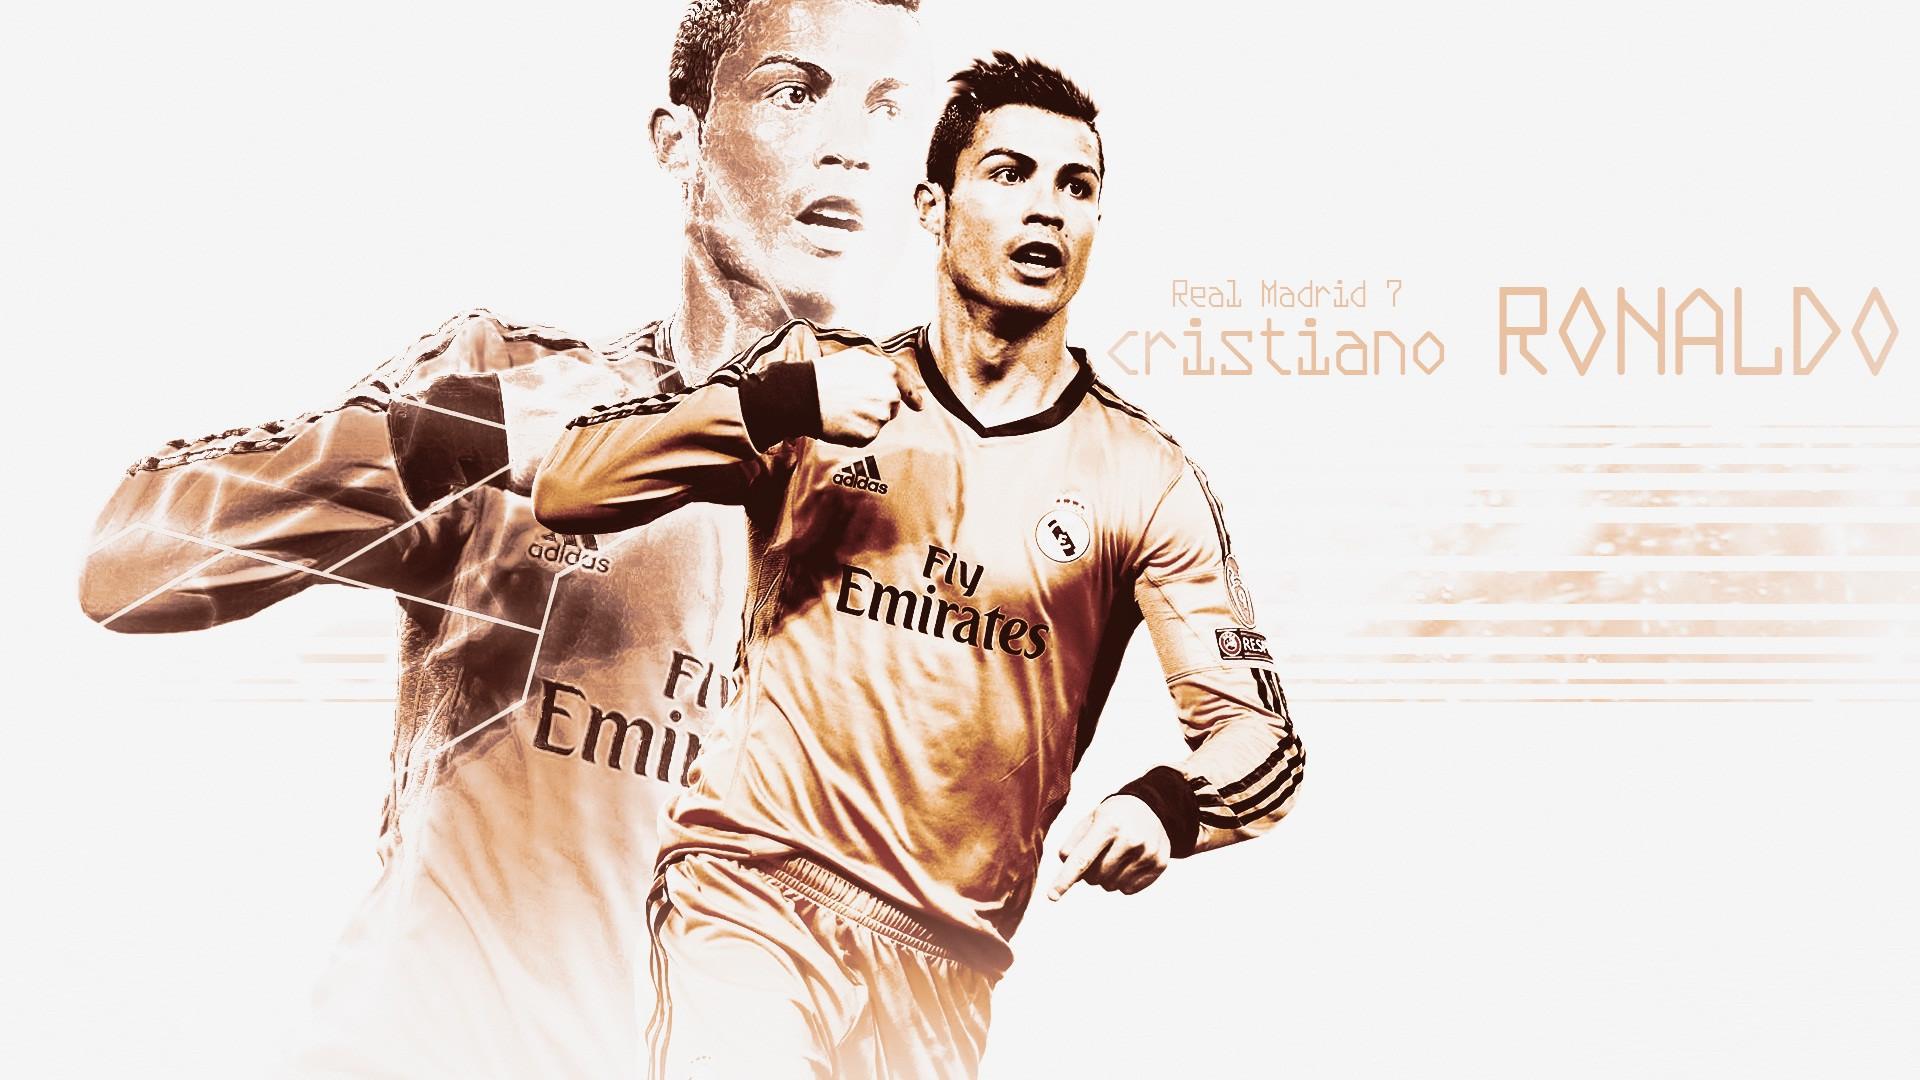 real madrid football star cristiano ronaldo image wallpaper